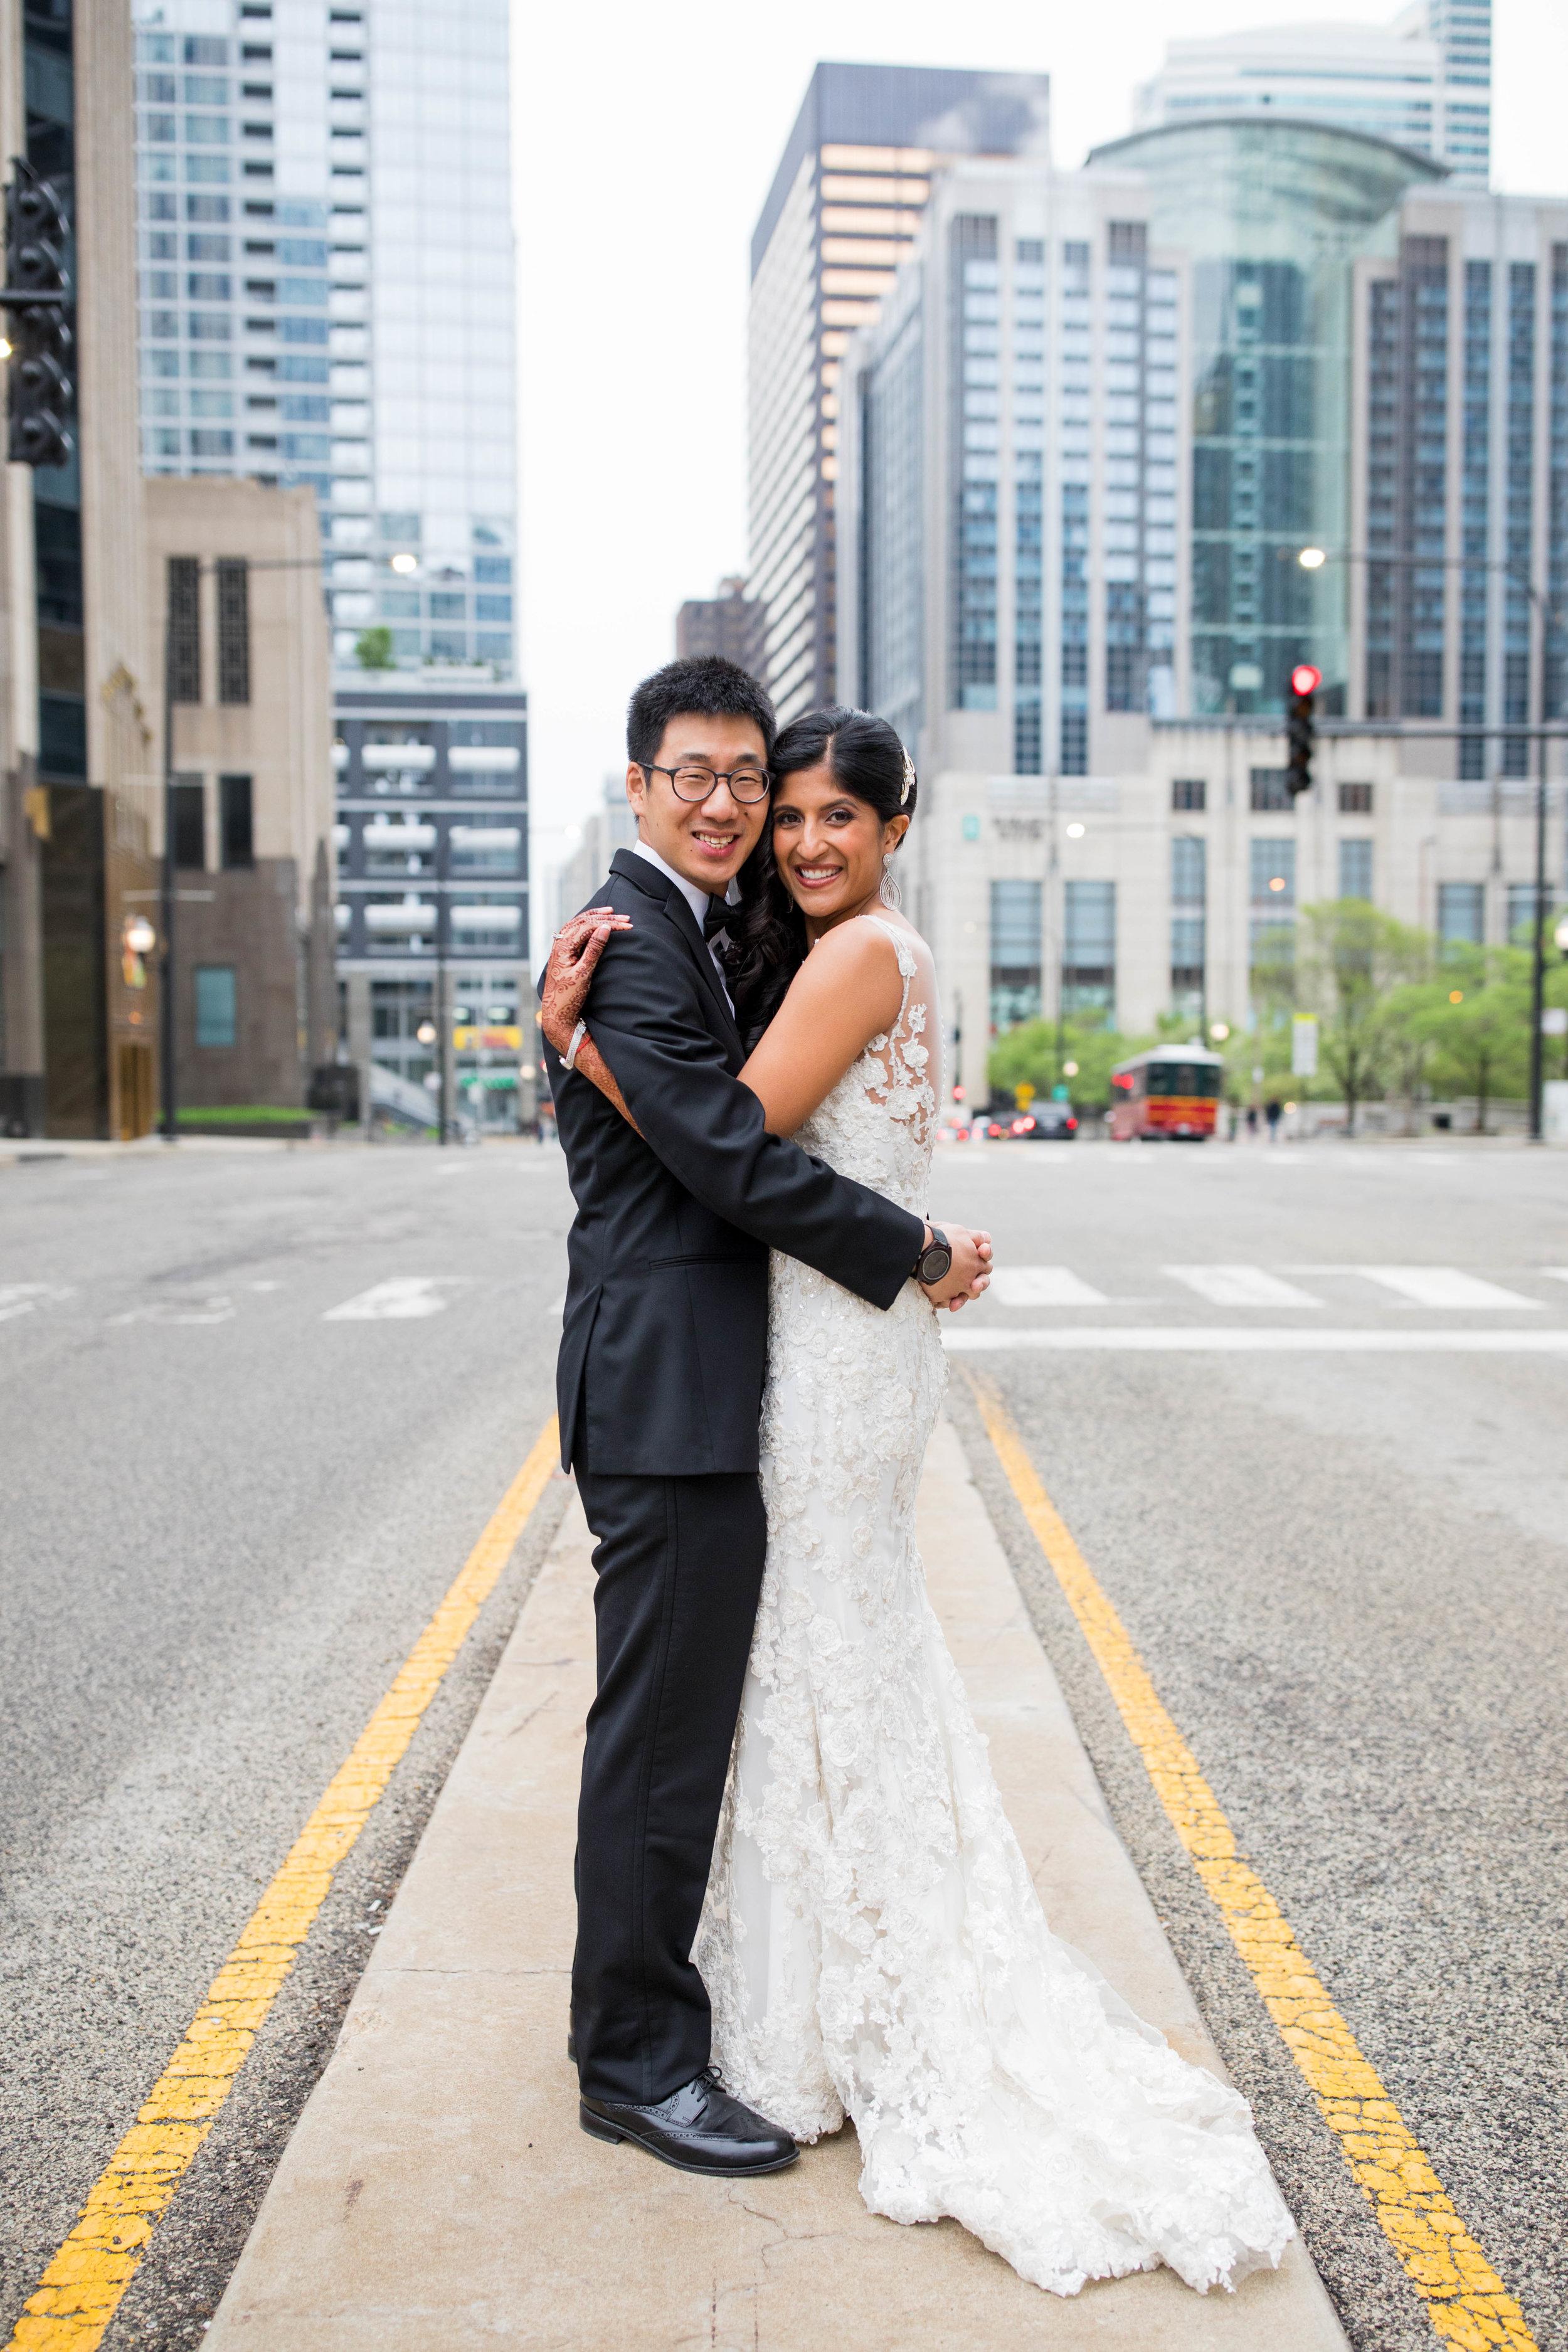 LeCapeWeddings - Chicago South Asian Wedding -99.jpg